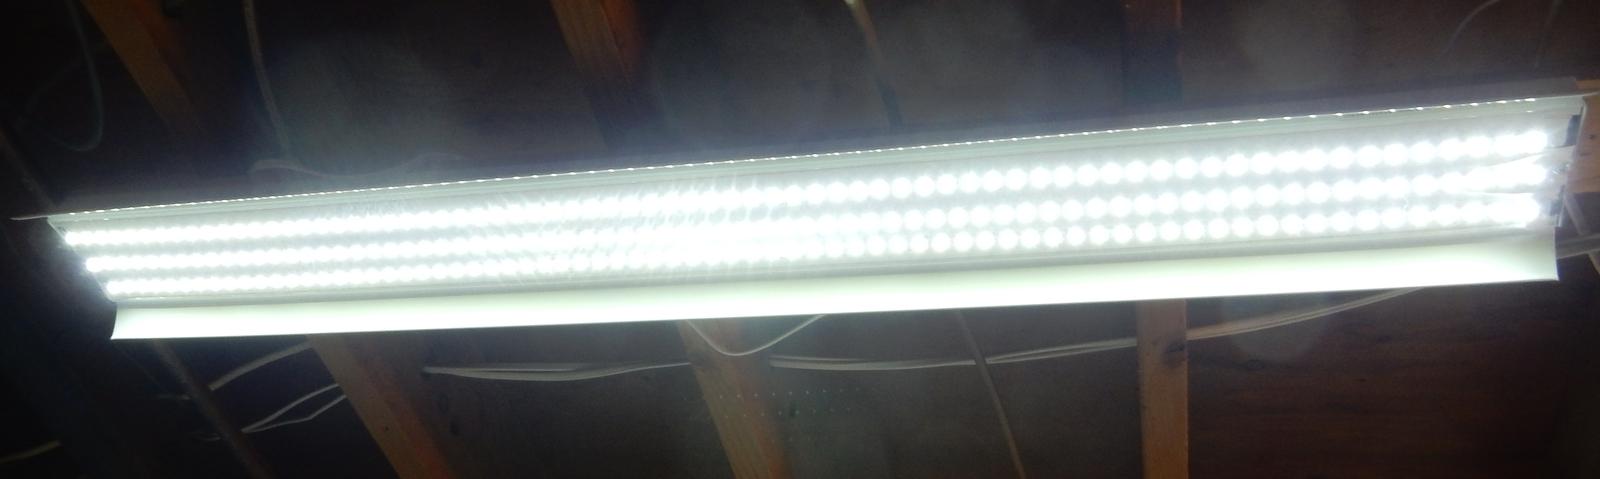 Kit: 60W Power Supply + 8' LED Strip, Bright White, Florescent Tube Retrofit